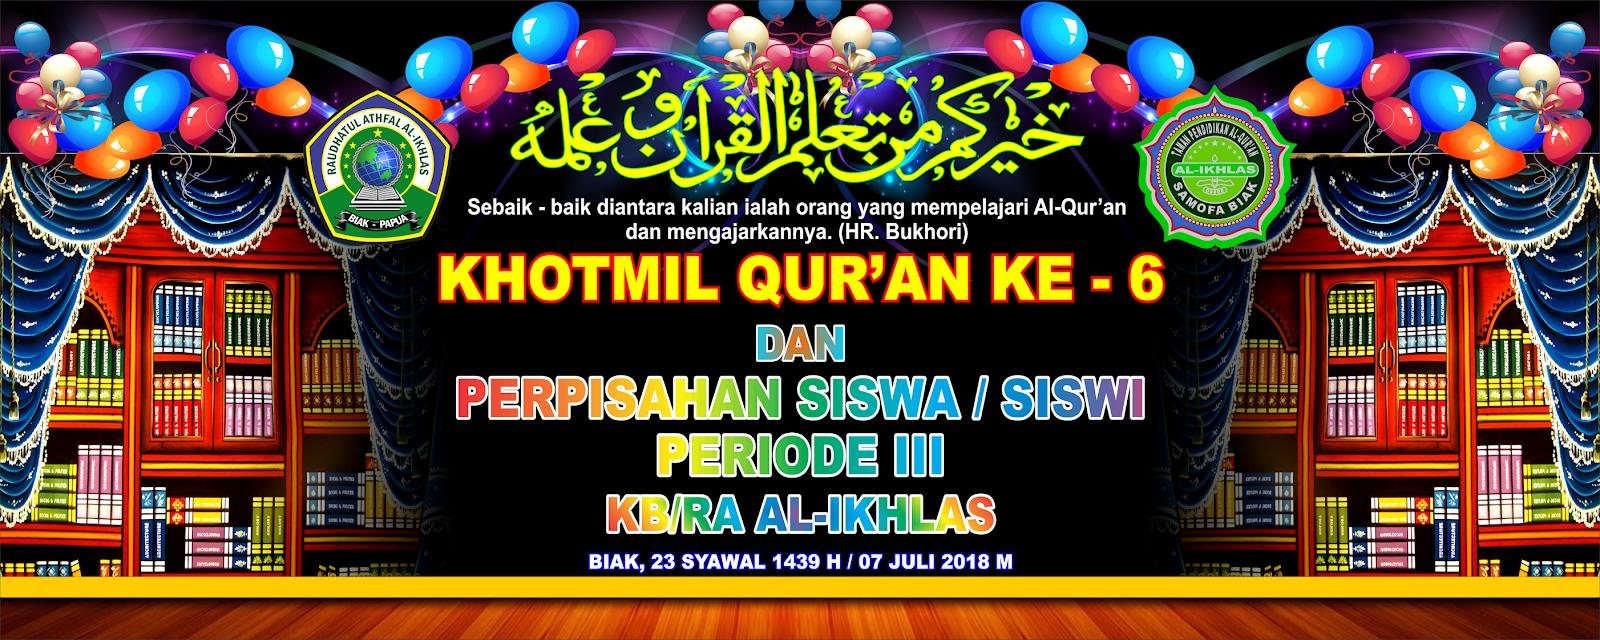 Banner Khotmil Qur'an